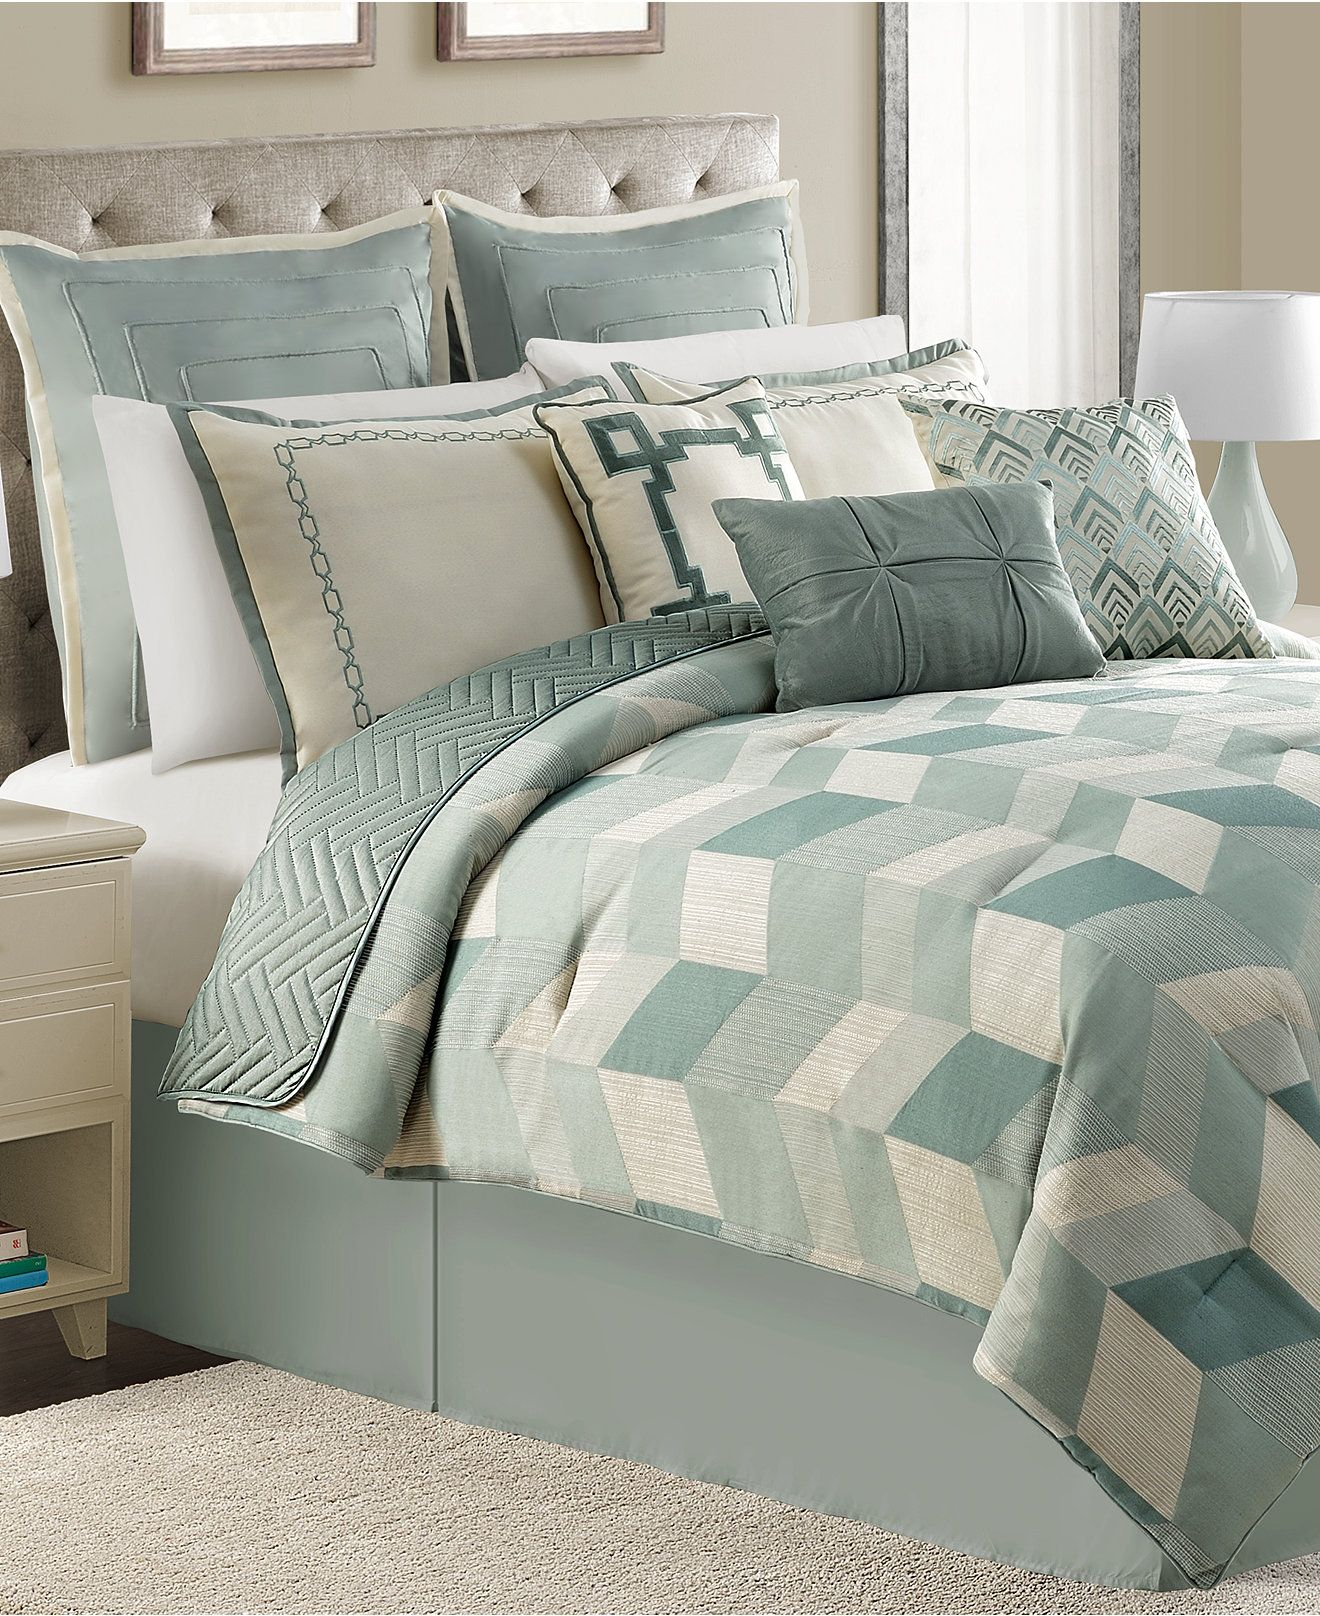 Brighton 10 Piece Queen Comforter Set - Bed in a Bag - Bed ...